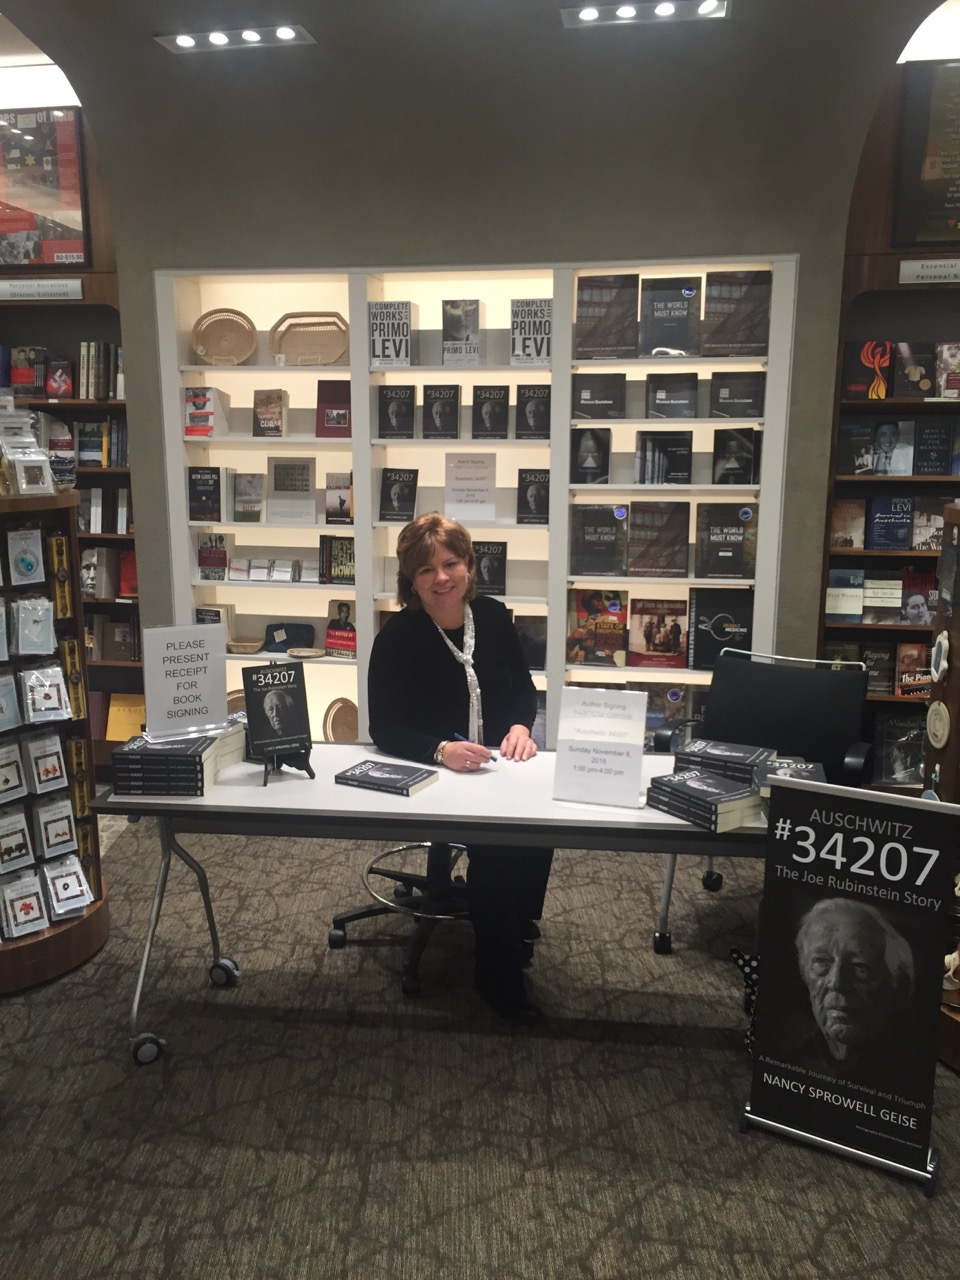 Book Signing at United States Holocaust Memorial Museum, Washington, D.C. (2015)